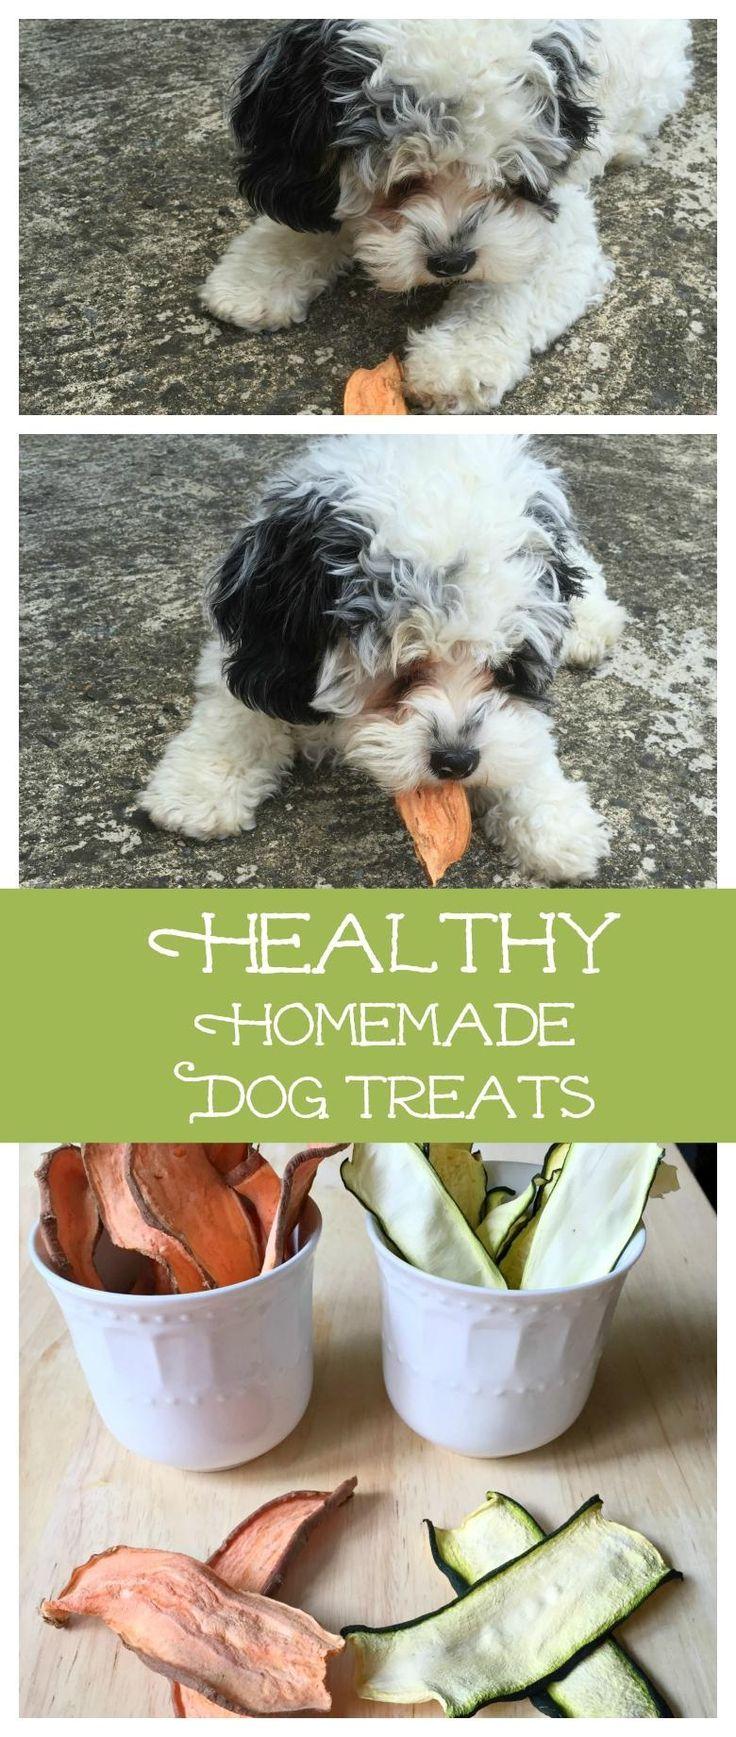 best dog stuff images on pinterest dog stuff pet beds and animals